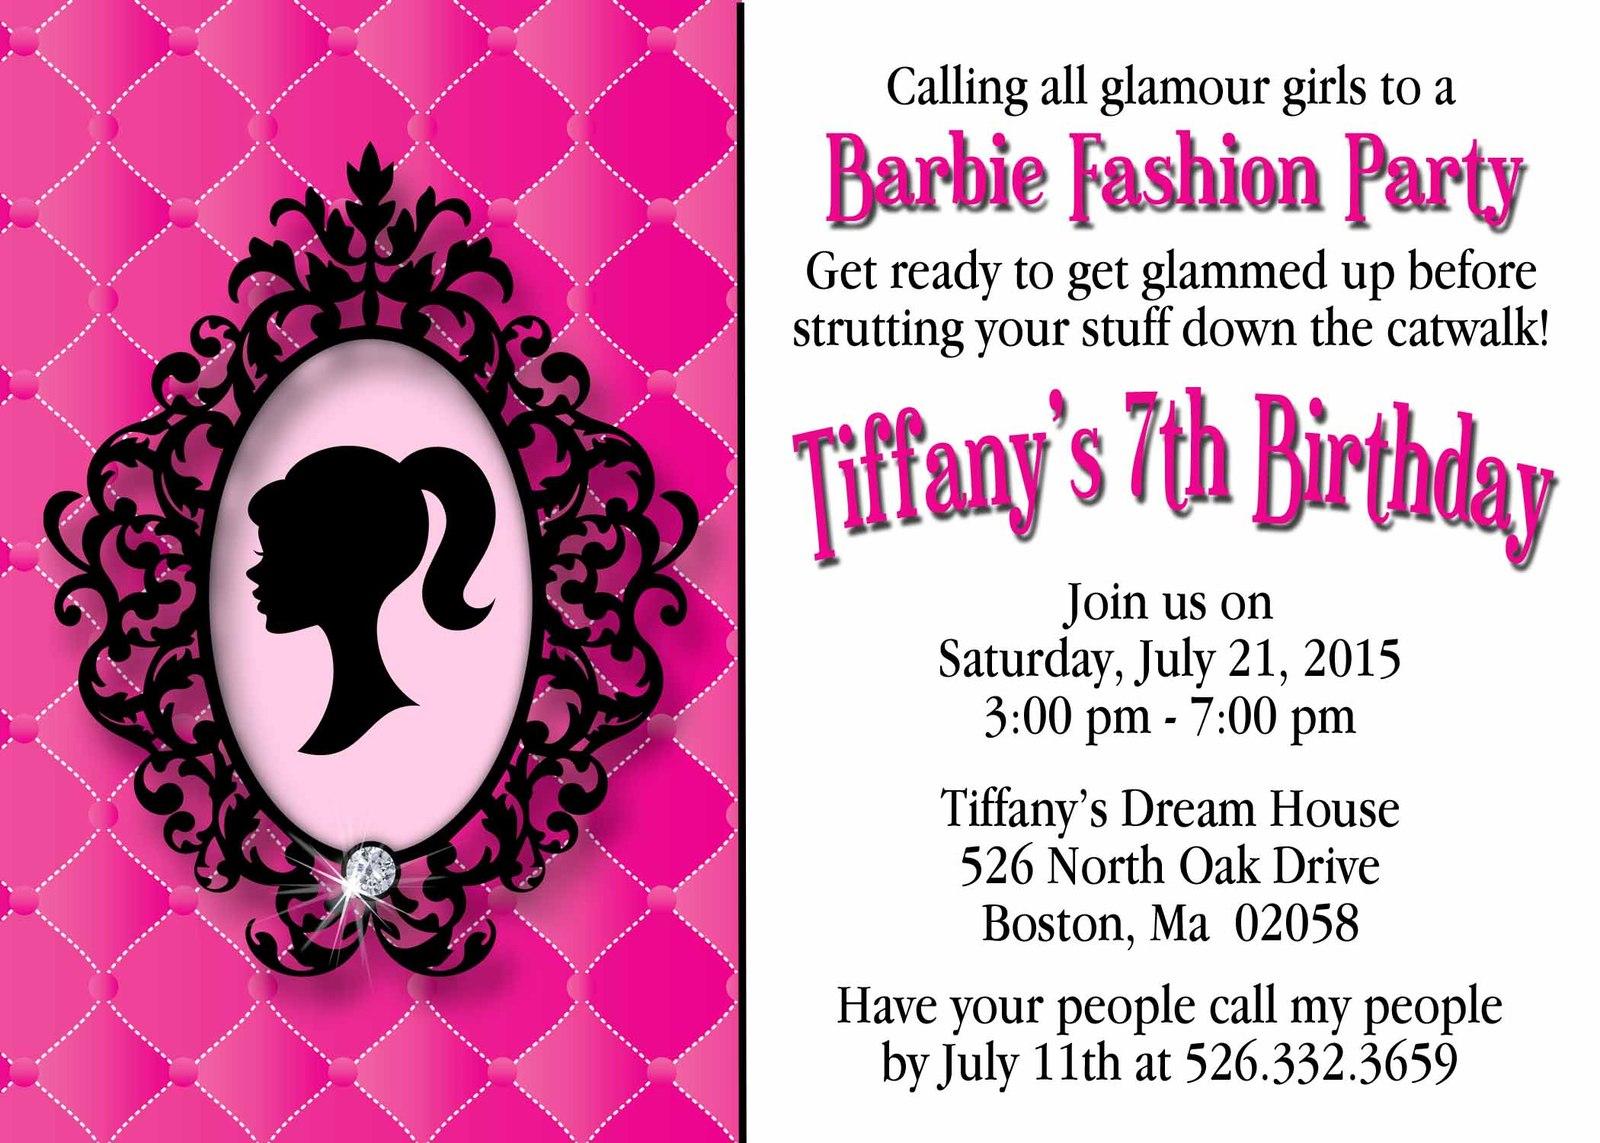 7th birthday invitation barbie theme